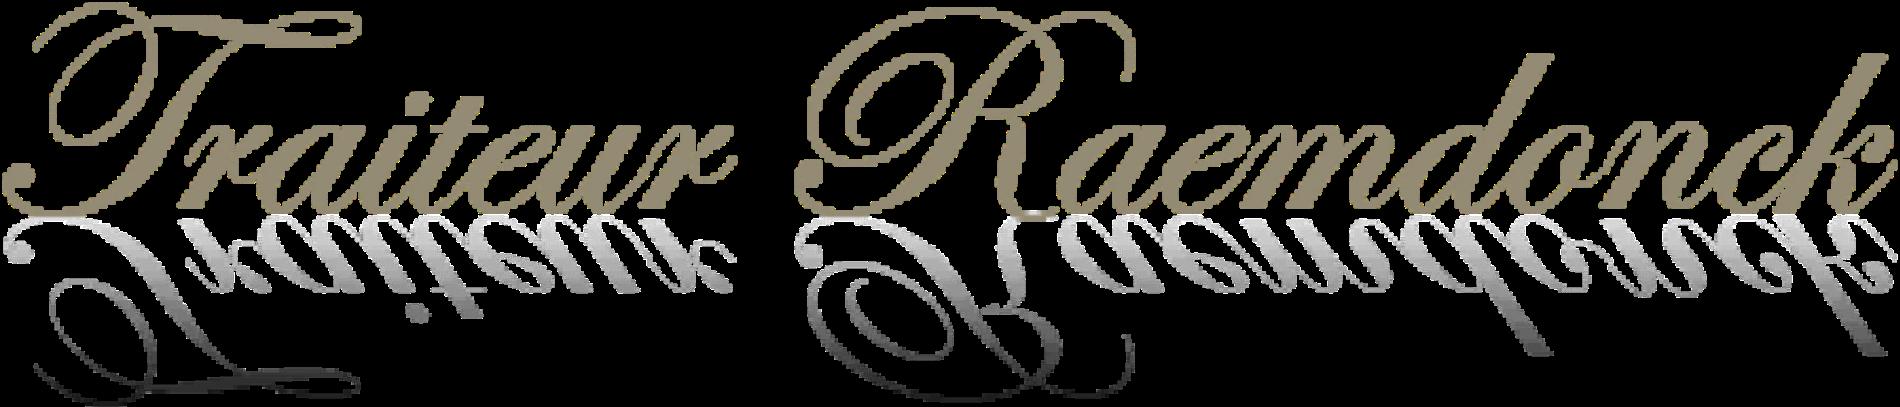 Logo traiteurraemdonck